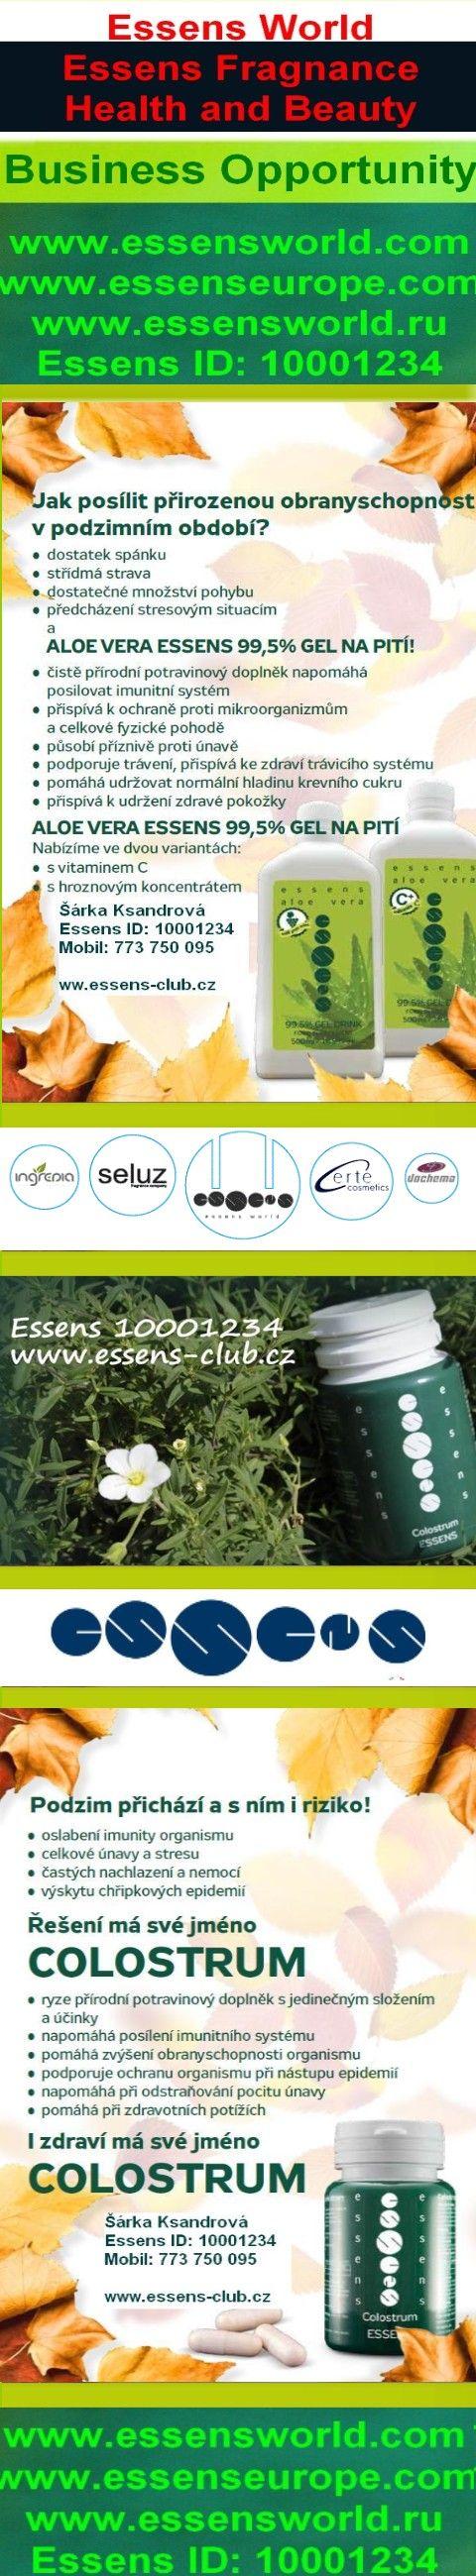 Aloe Vera Gel - detoxikae organismu, podpora imunitního systému - http://www.essens-club.cz/podzim-s-essens.html